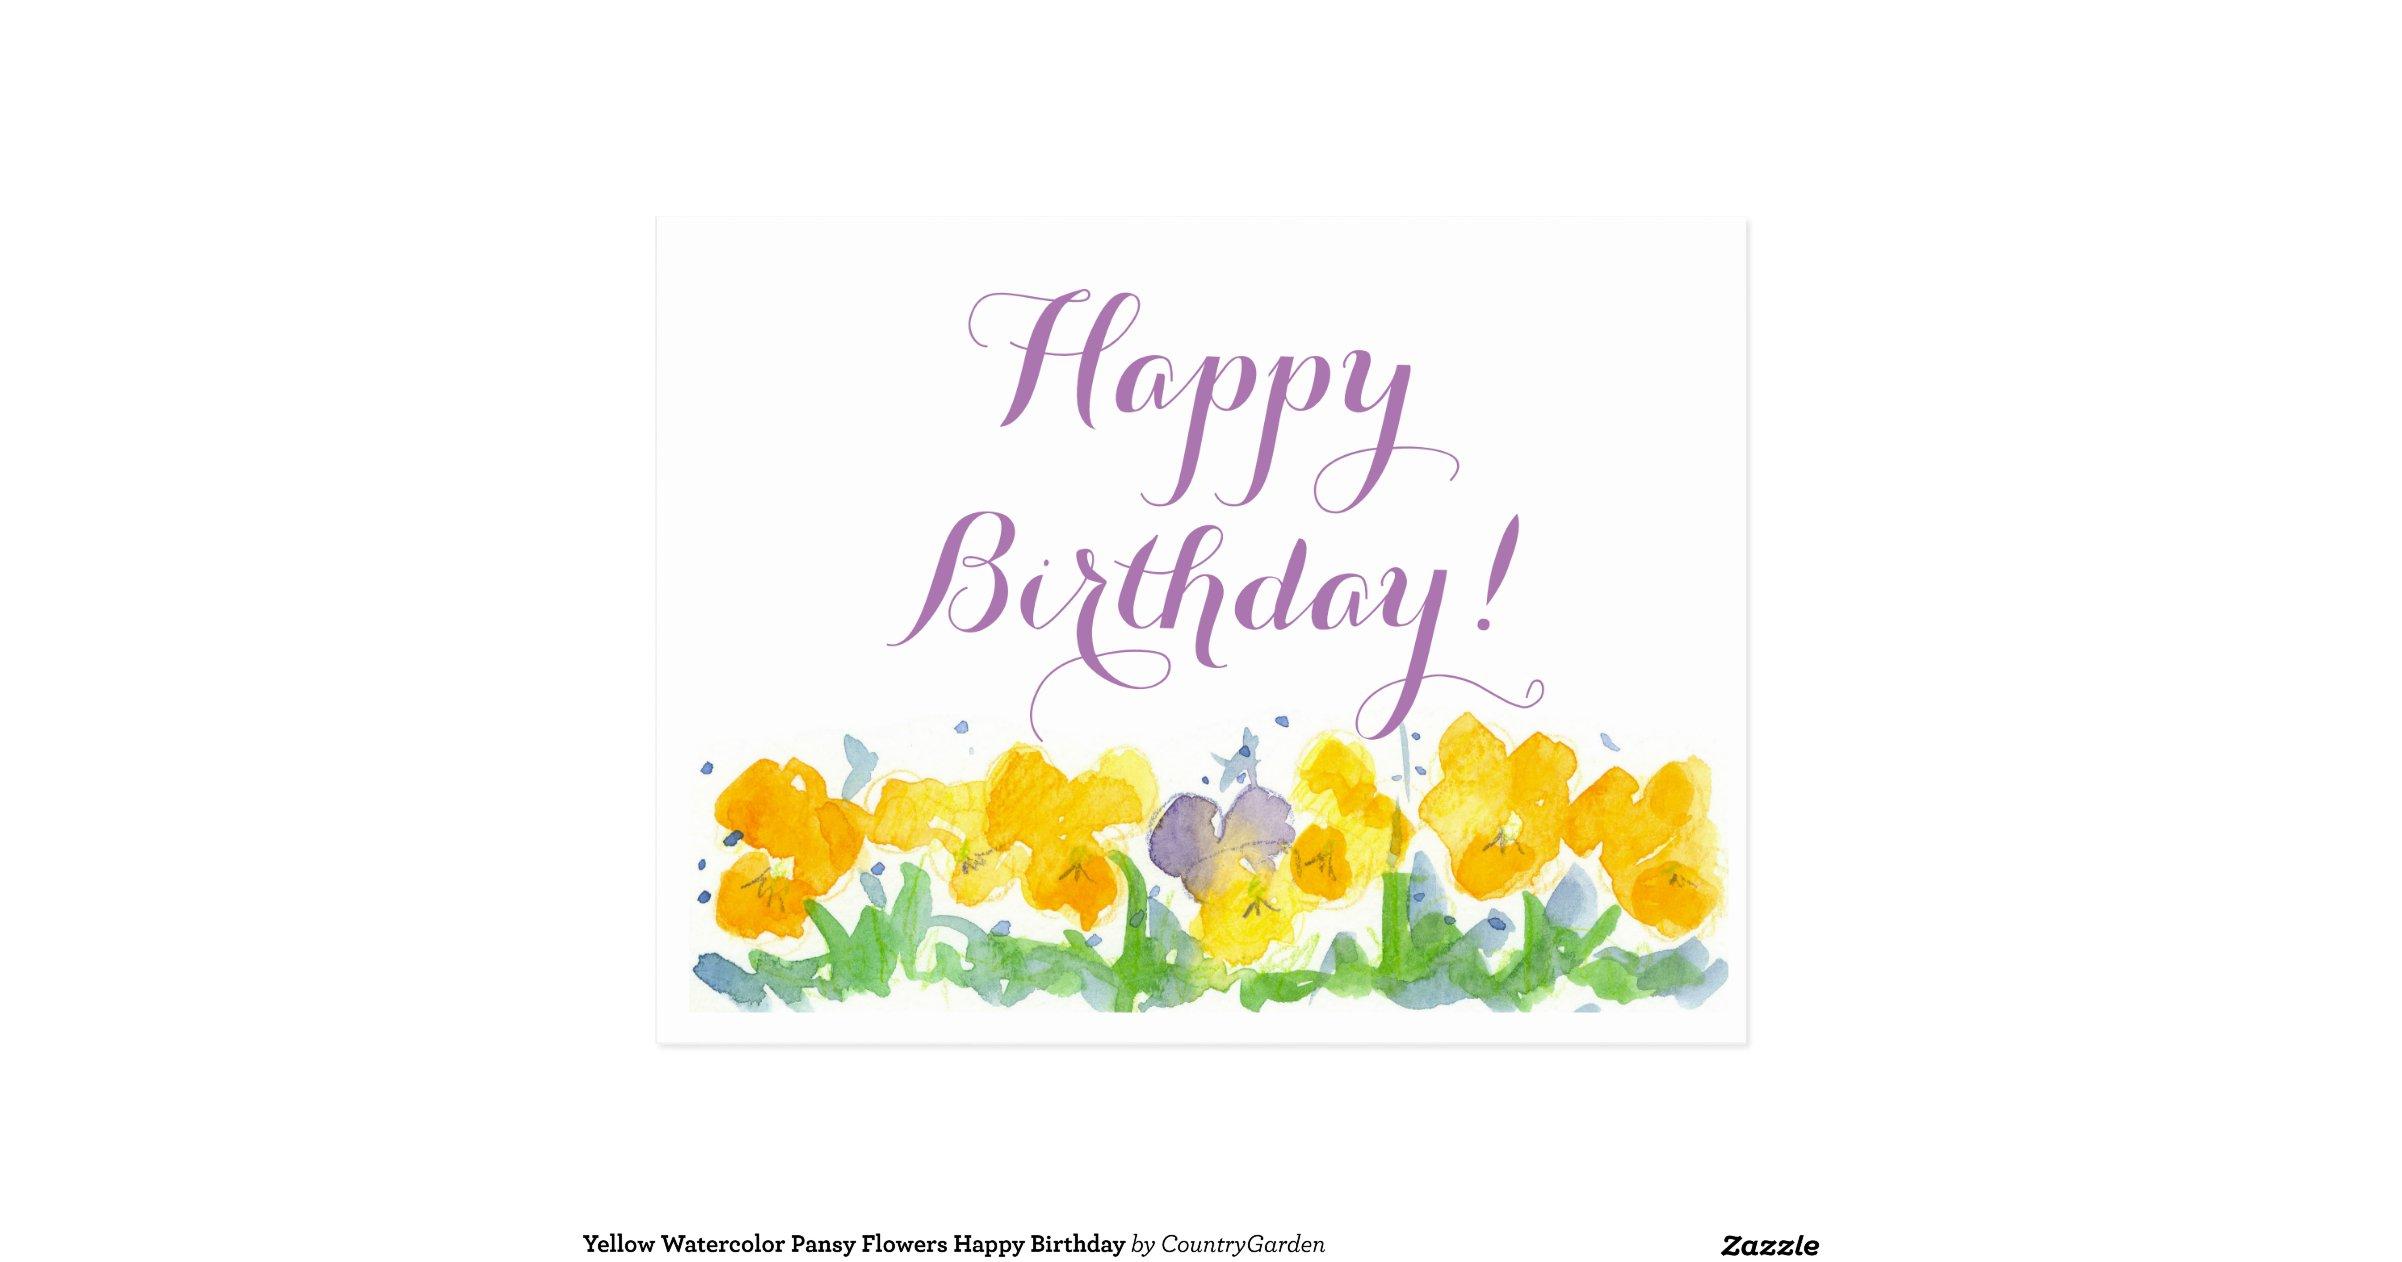 Yellowwatercolorpansyflowershappybirthdaypostcard